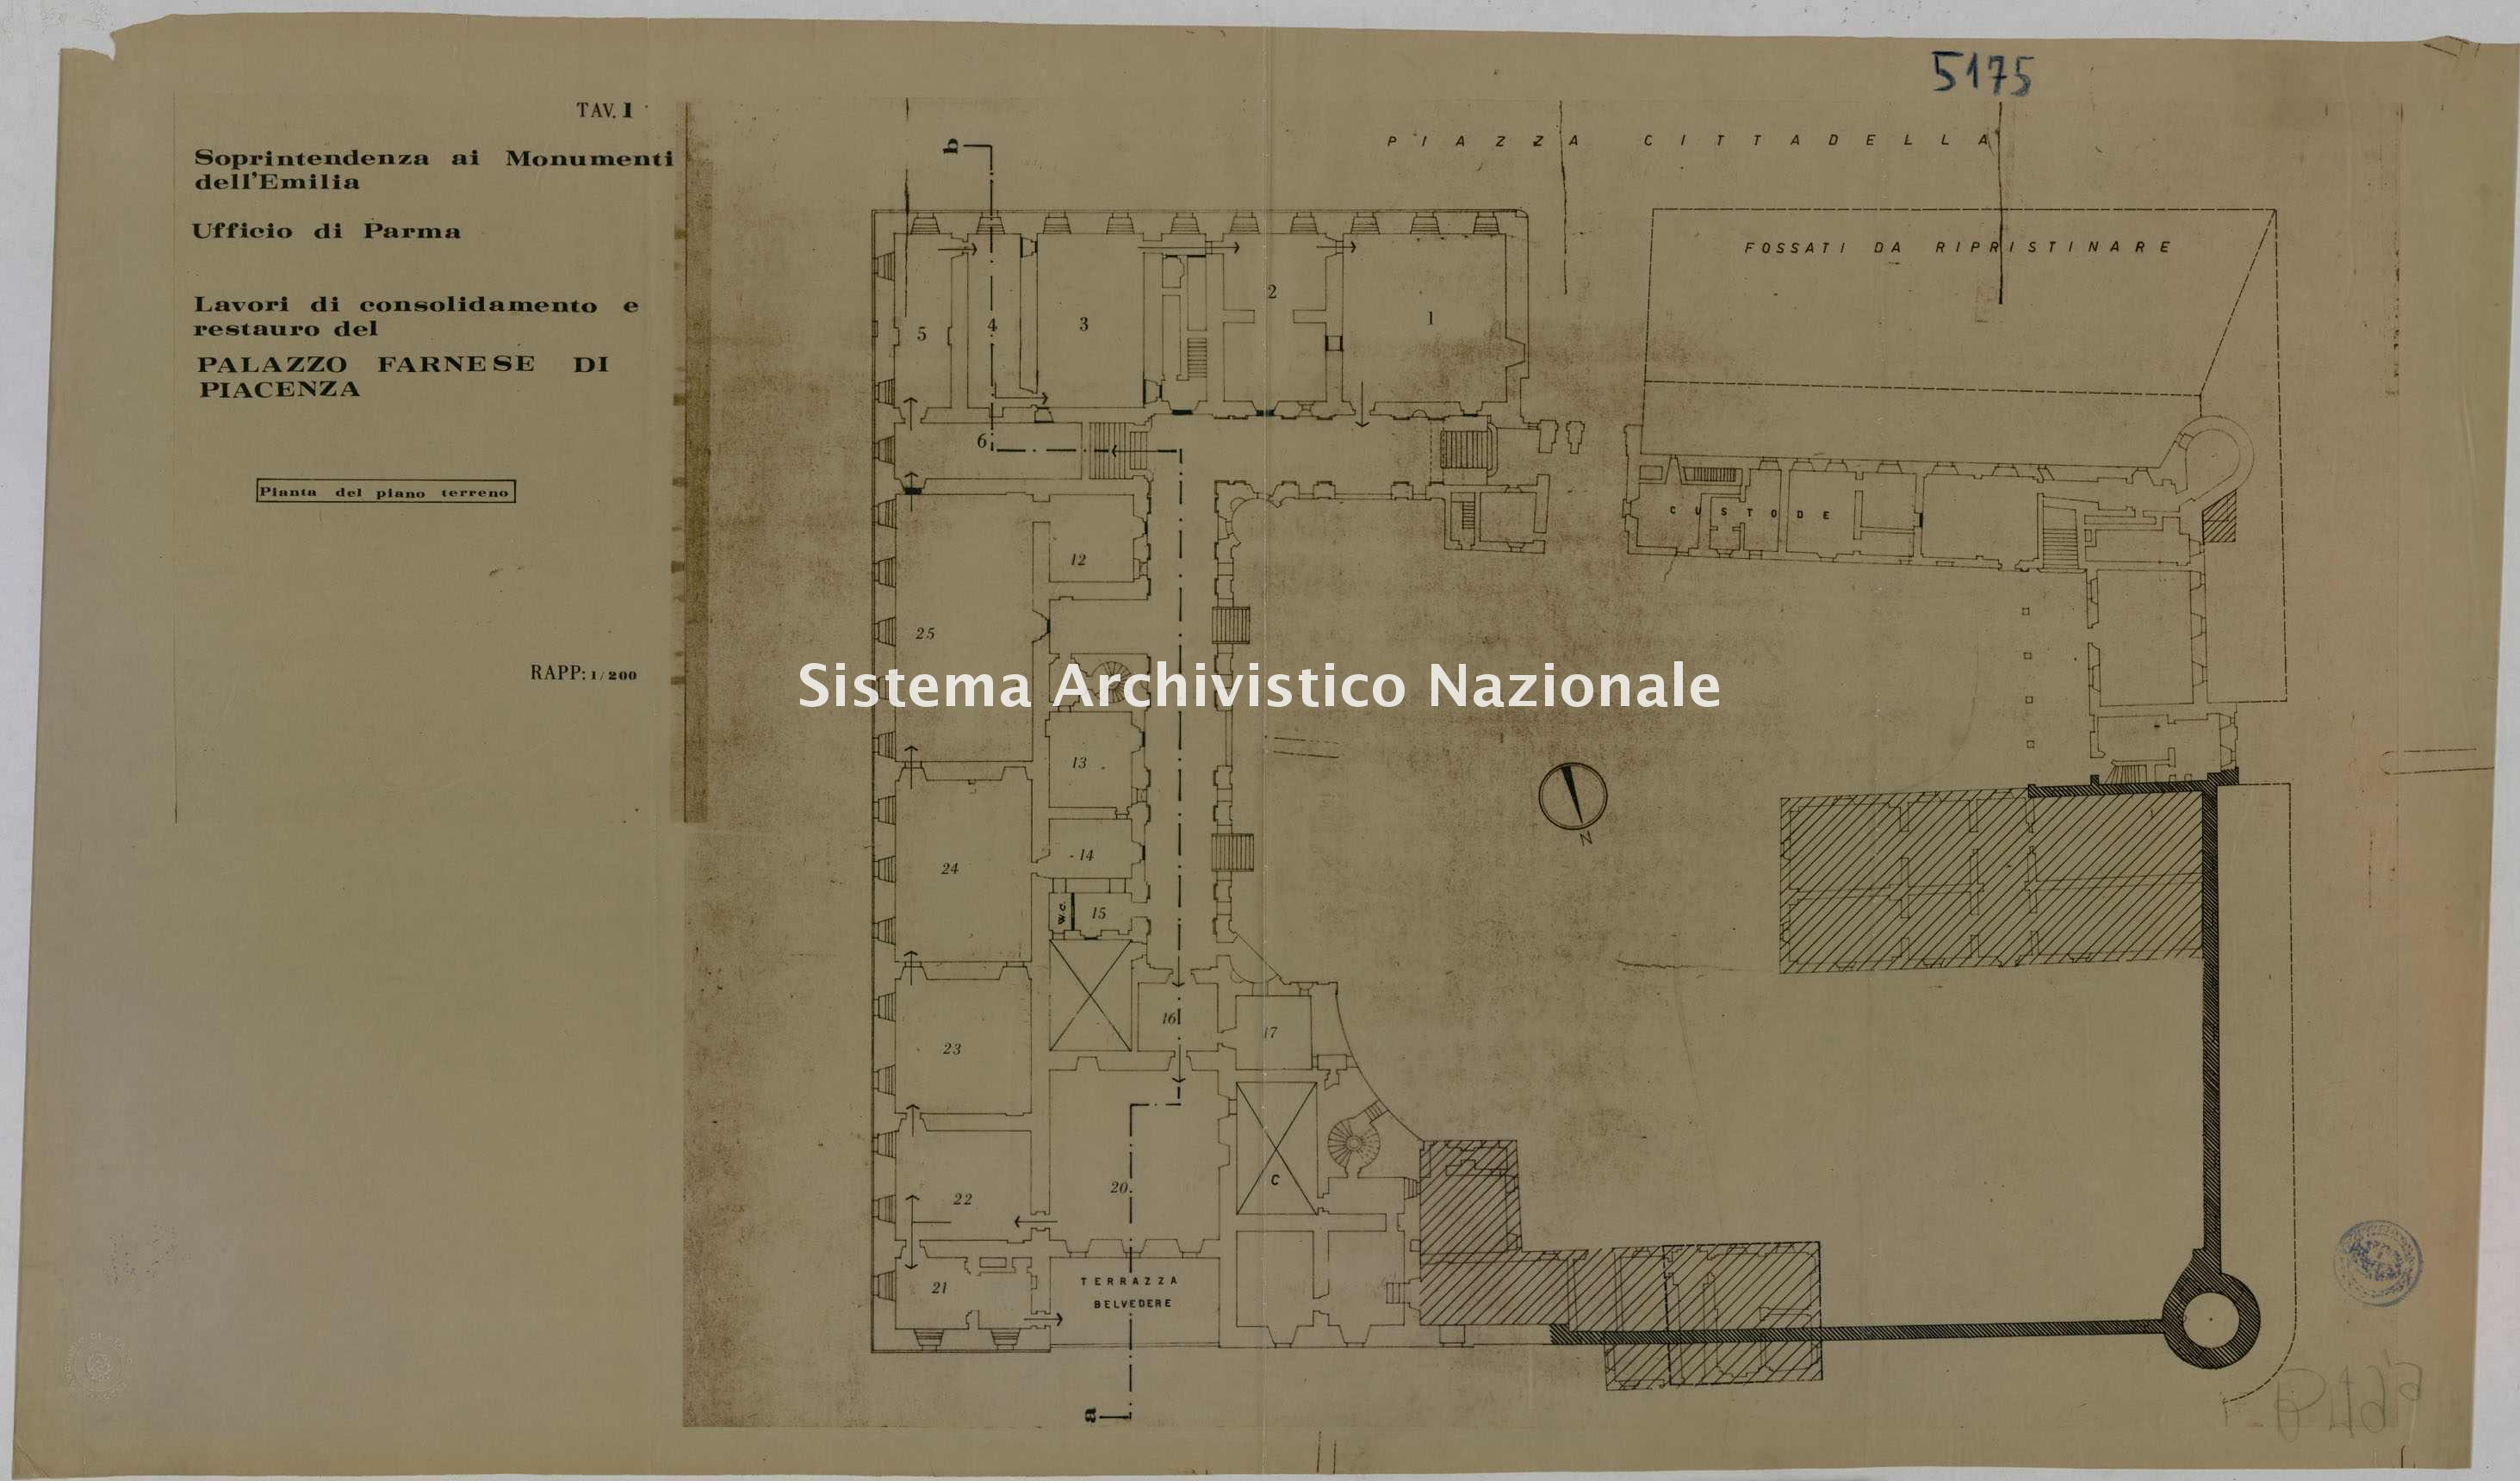 ASPC Mappe, stampe e disegni, n. 5175